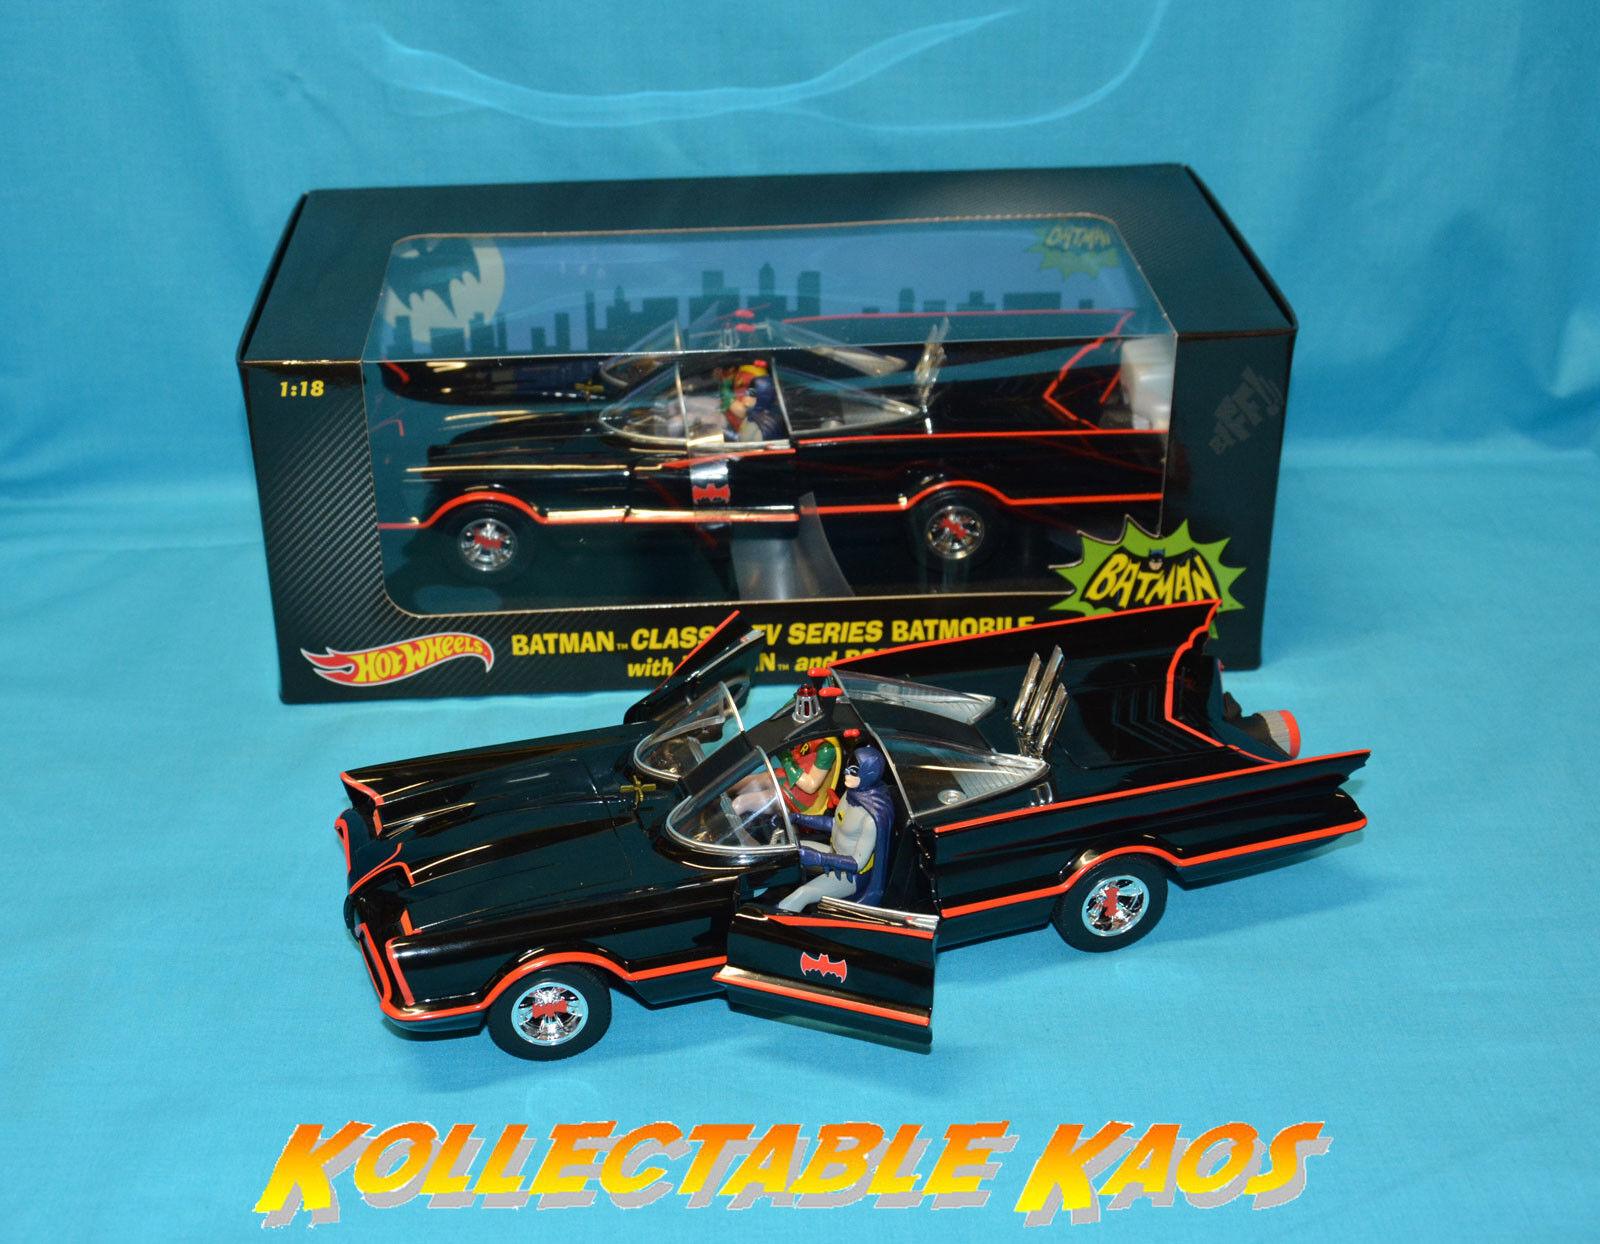 Hotwheels - 1 18 Batman 1966 TV Series Batmobile with Figures NEW - DJJ39